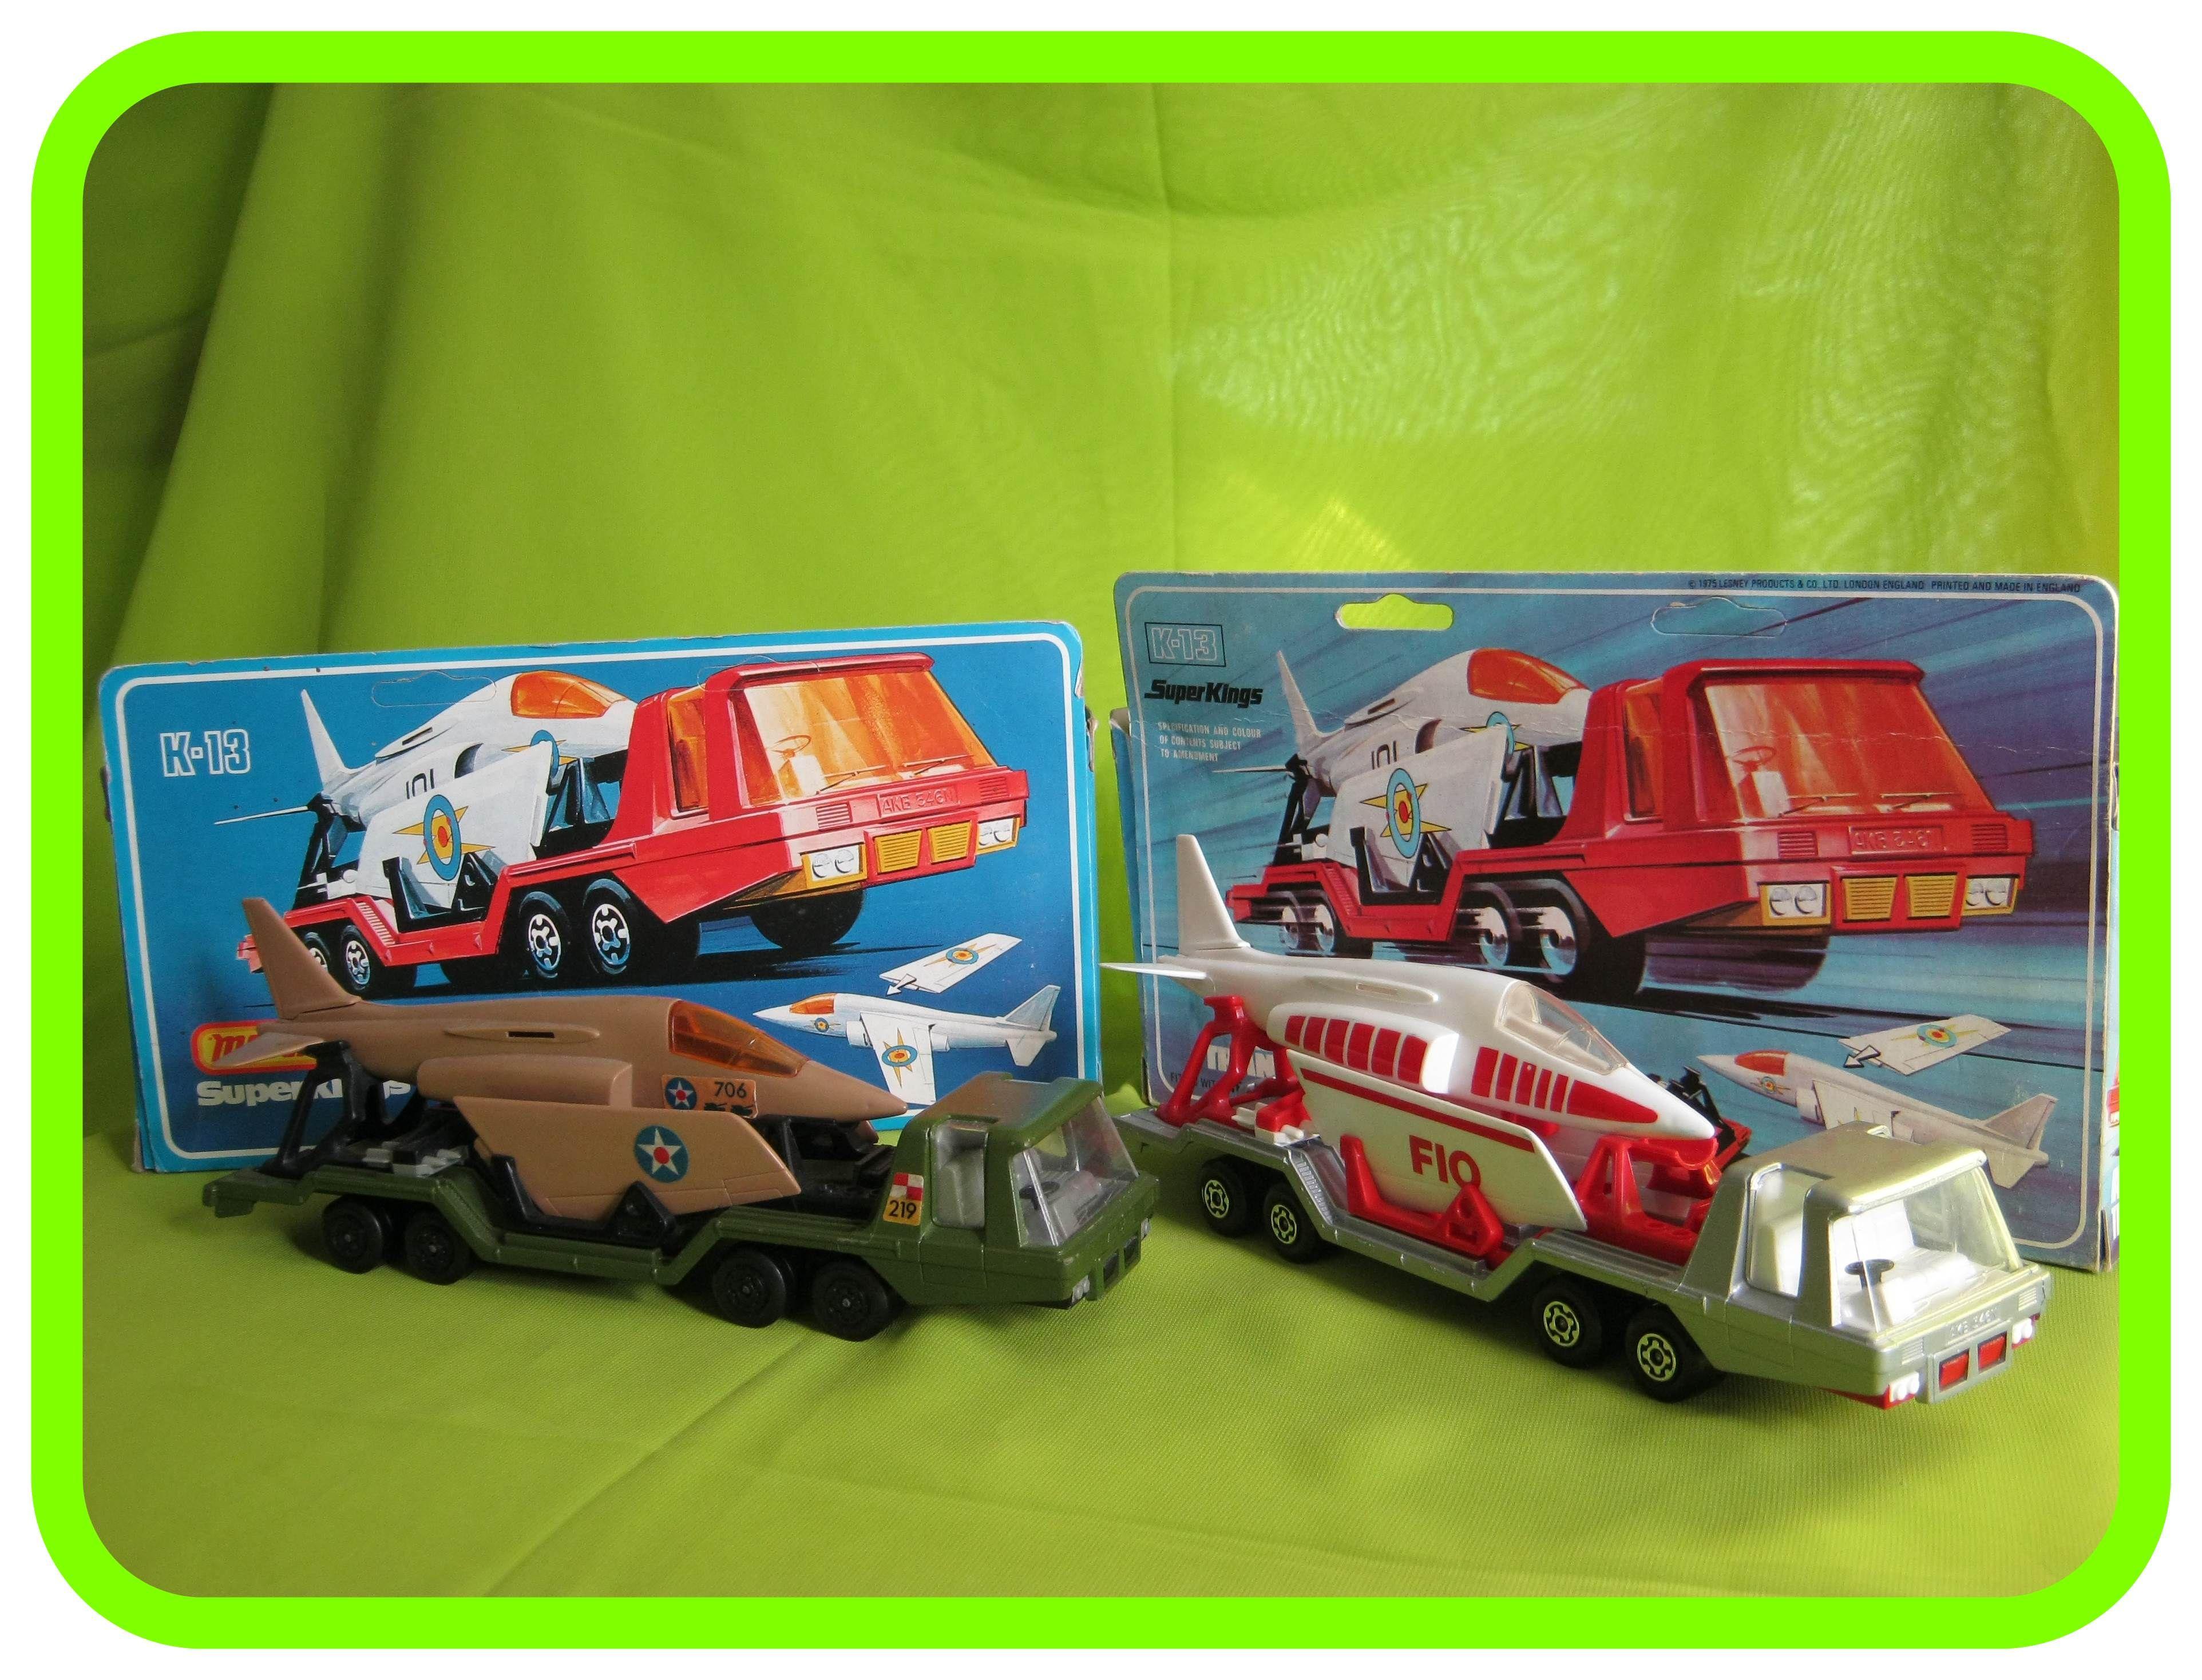 K114 Battlekings Aircraft Transporter Wrong Box K13 Aircraft Transporter Silver Mattel Hot Wheels Classic Toys Diecast Toy